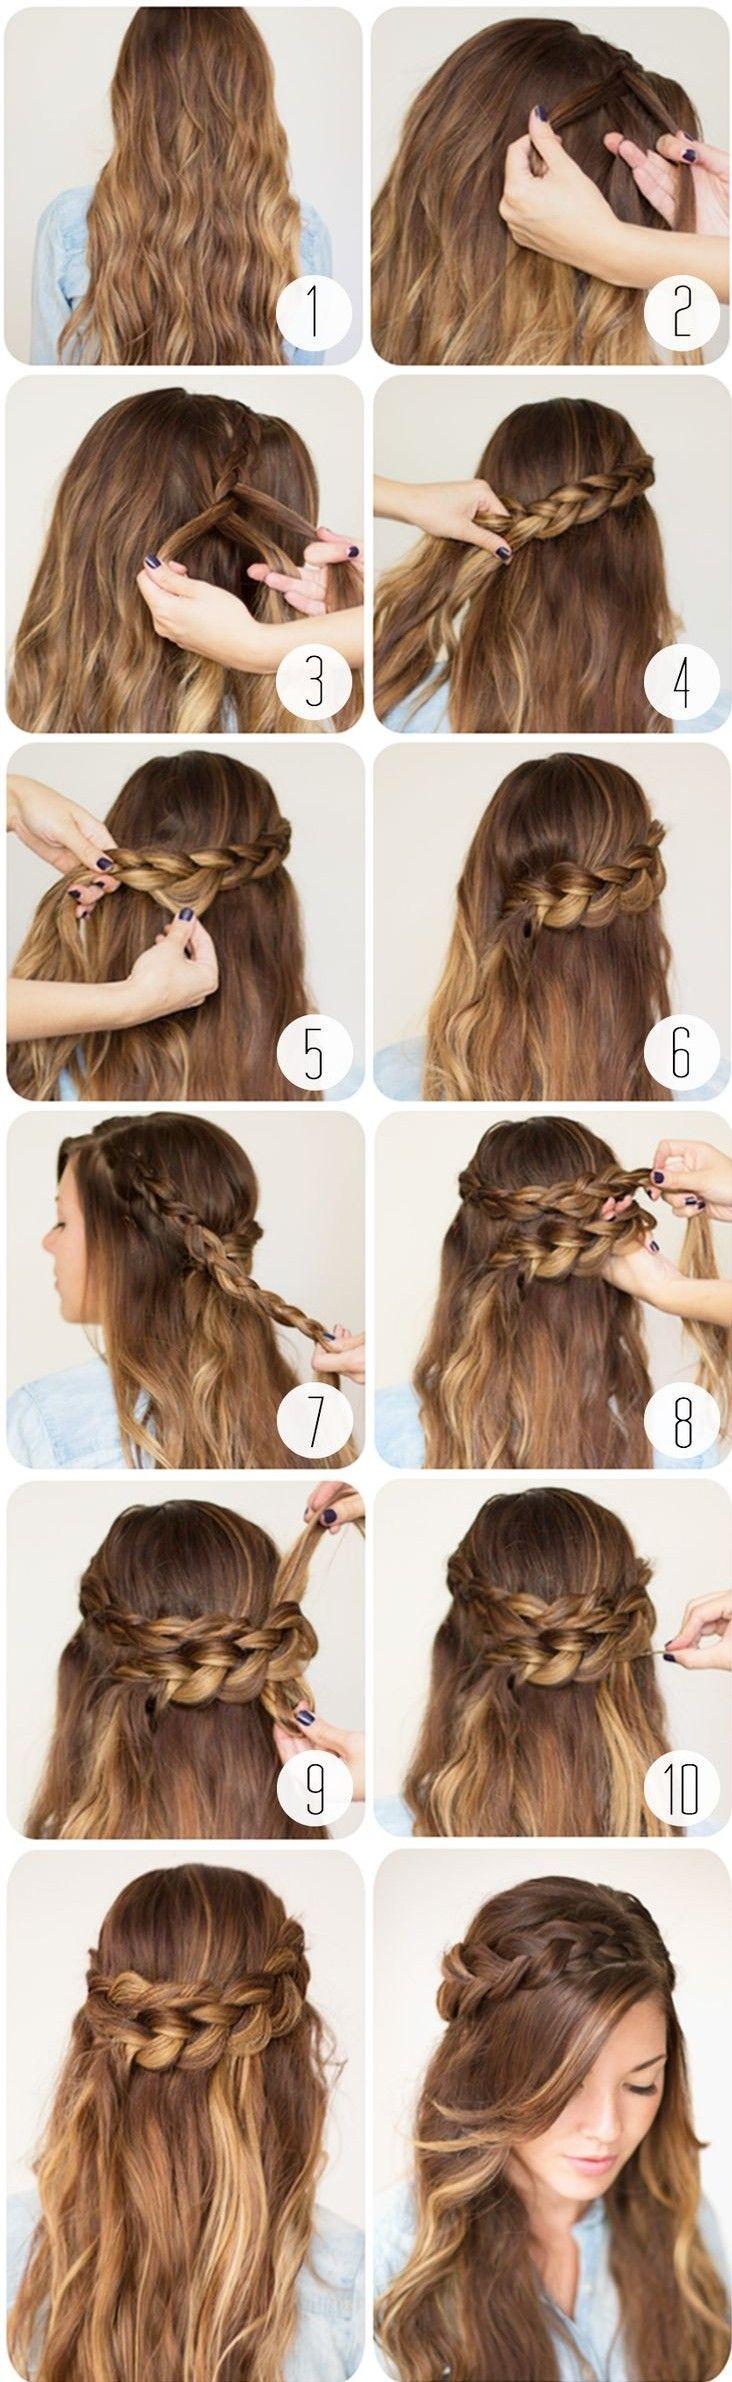 Awe Inspiring 1000 Images About Half Up Half Down With Braids On Pinterest Short Hairstyles Gunalazisus